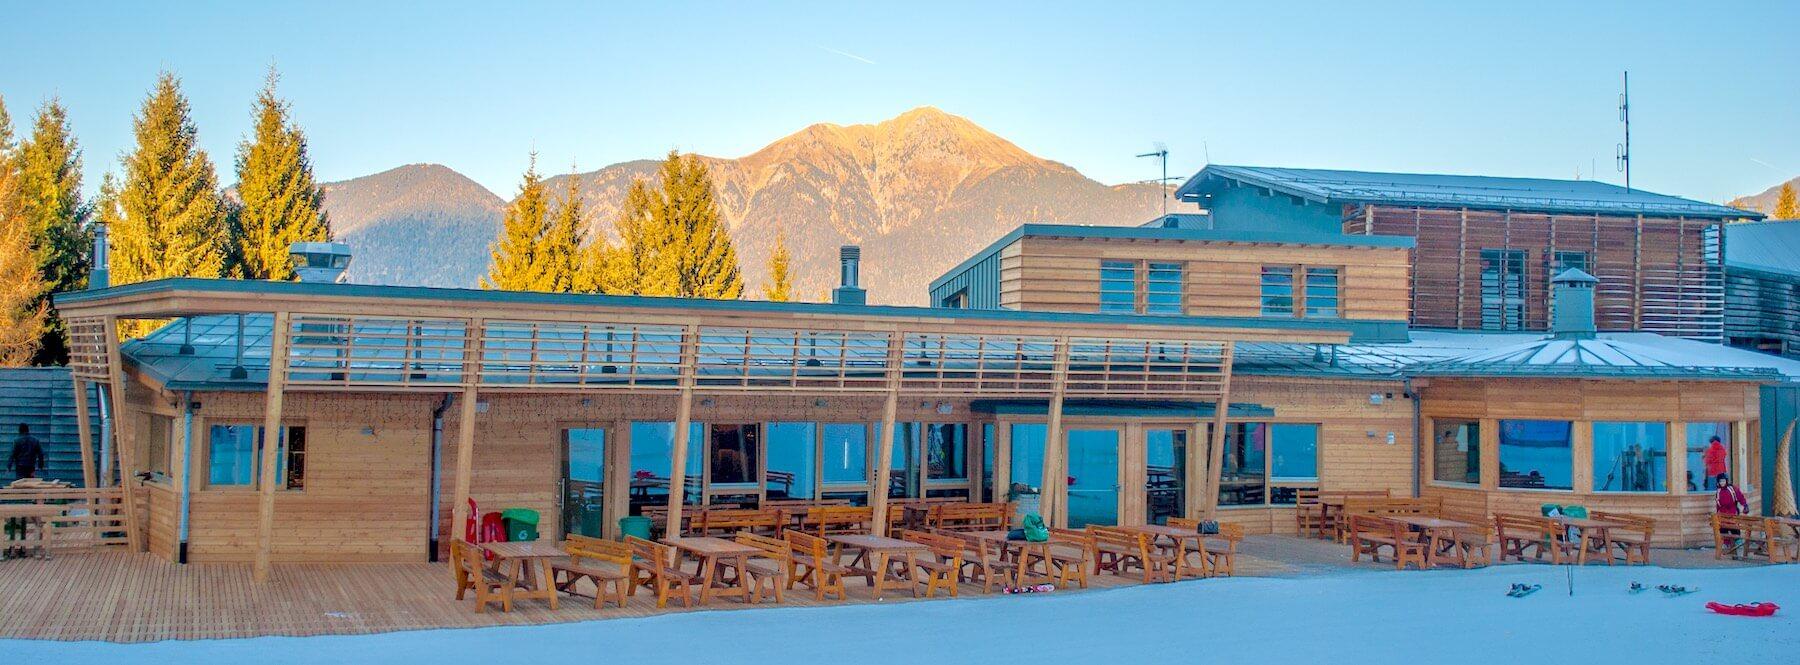 Ristorante Baita Tonda - Alpe Cermis - Val di Fiemme